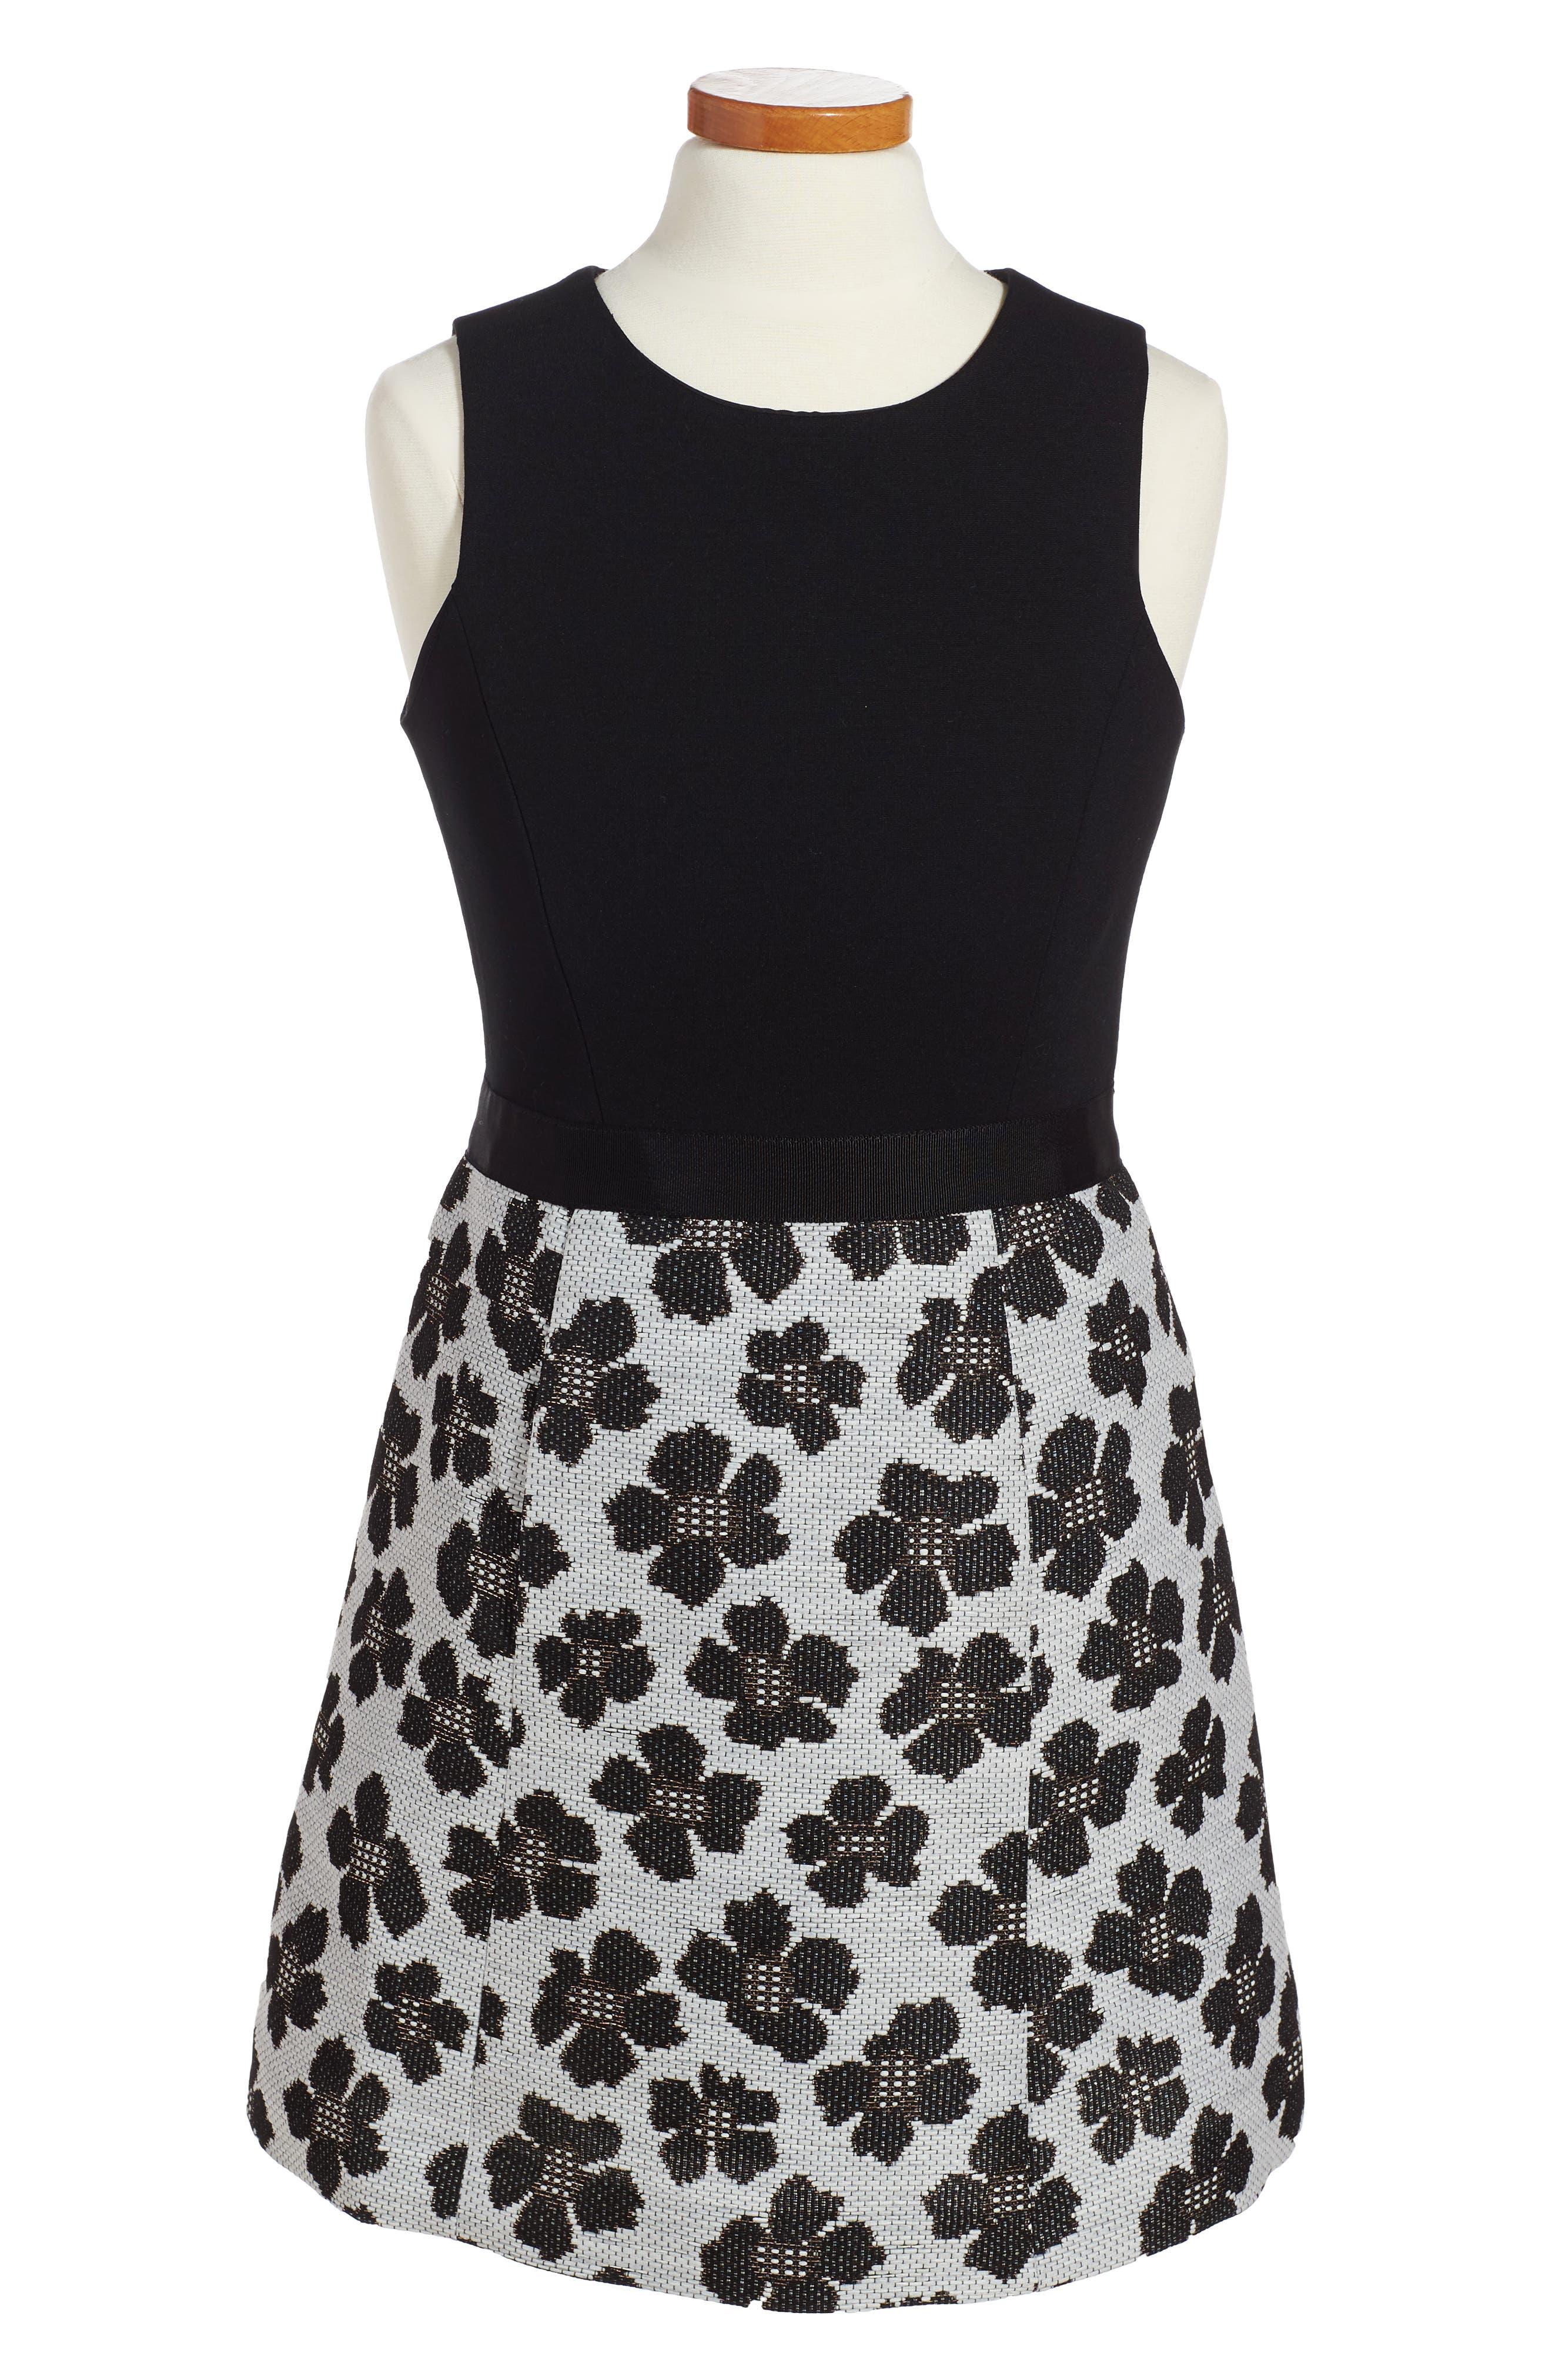 Milly Minis Floral Jacquard Dress (Toddler Girls, Little Girls & Big Girls)